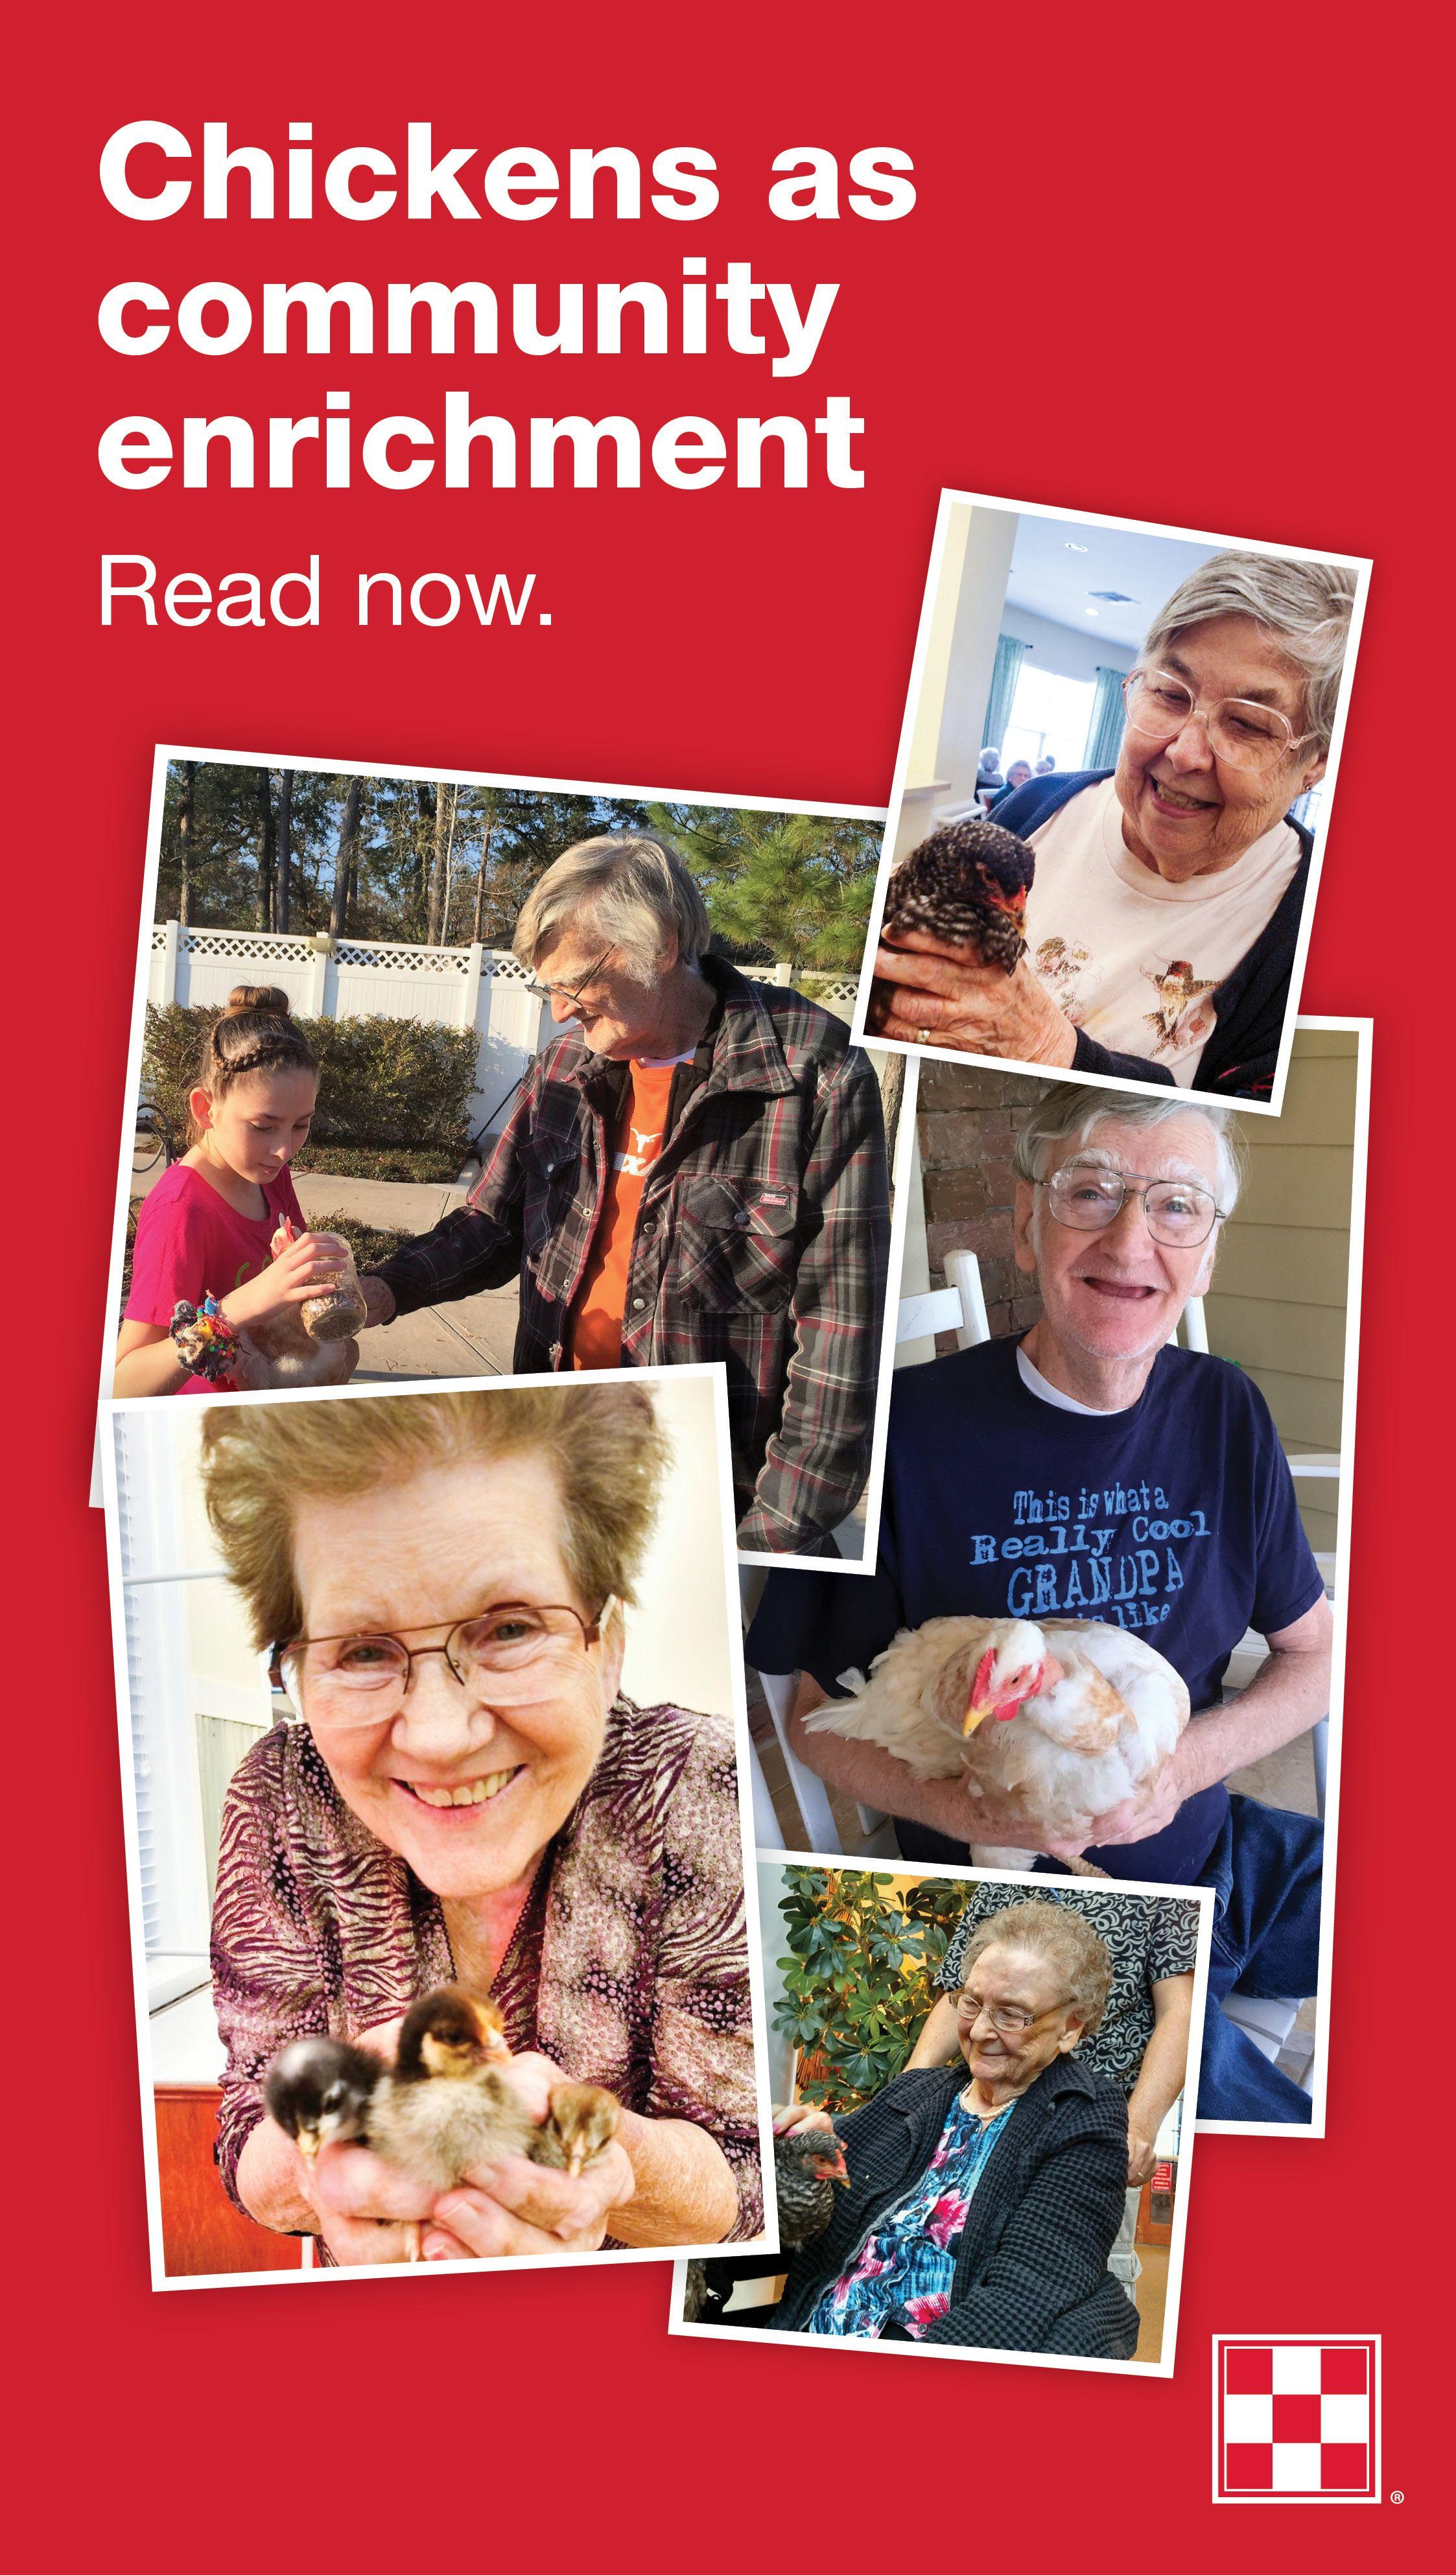 backyard chickens are perfect for senior community enrichment